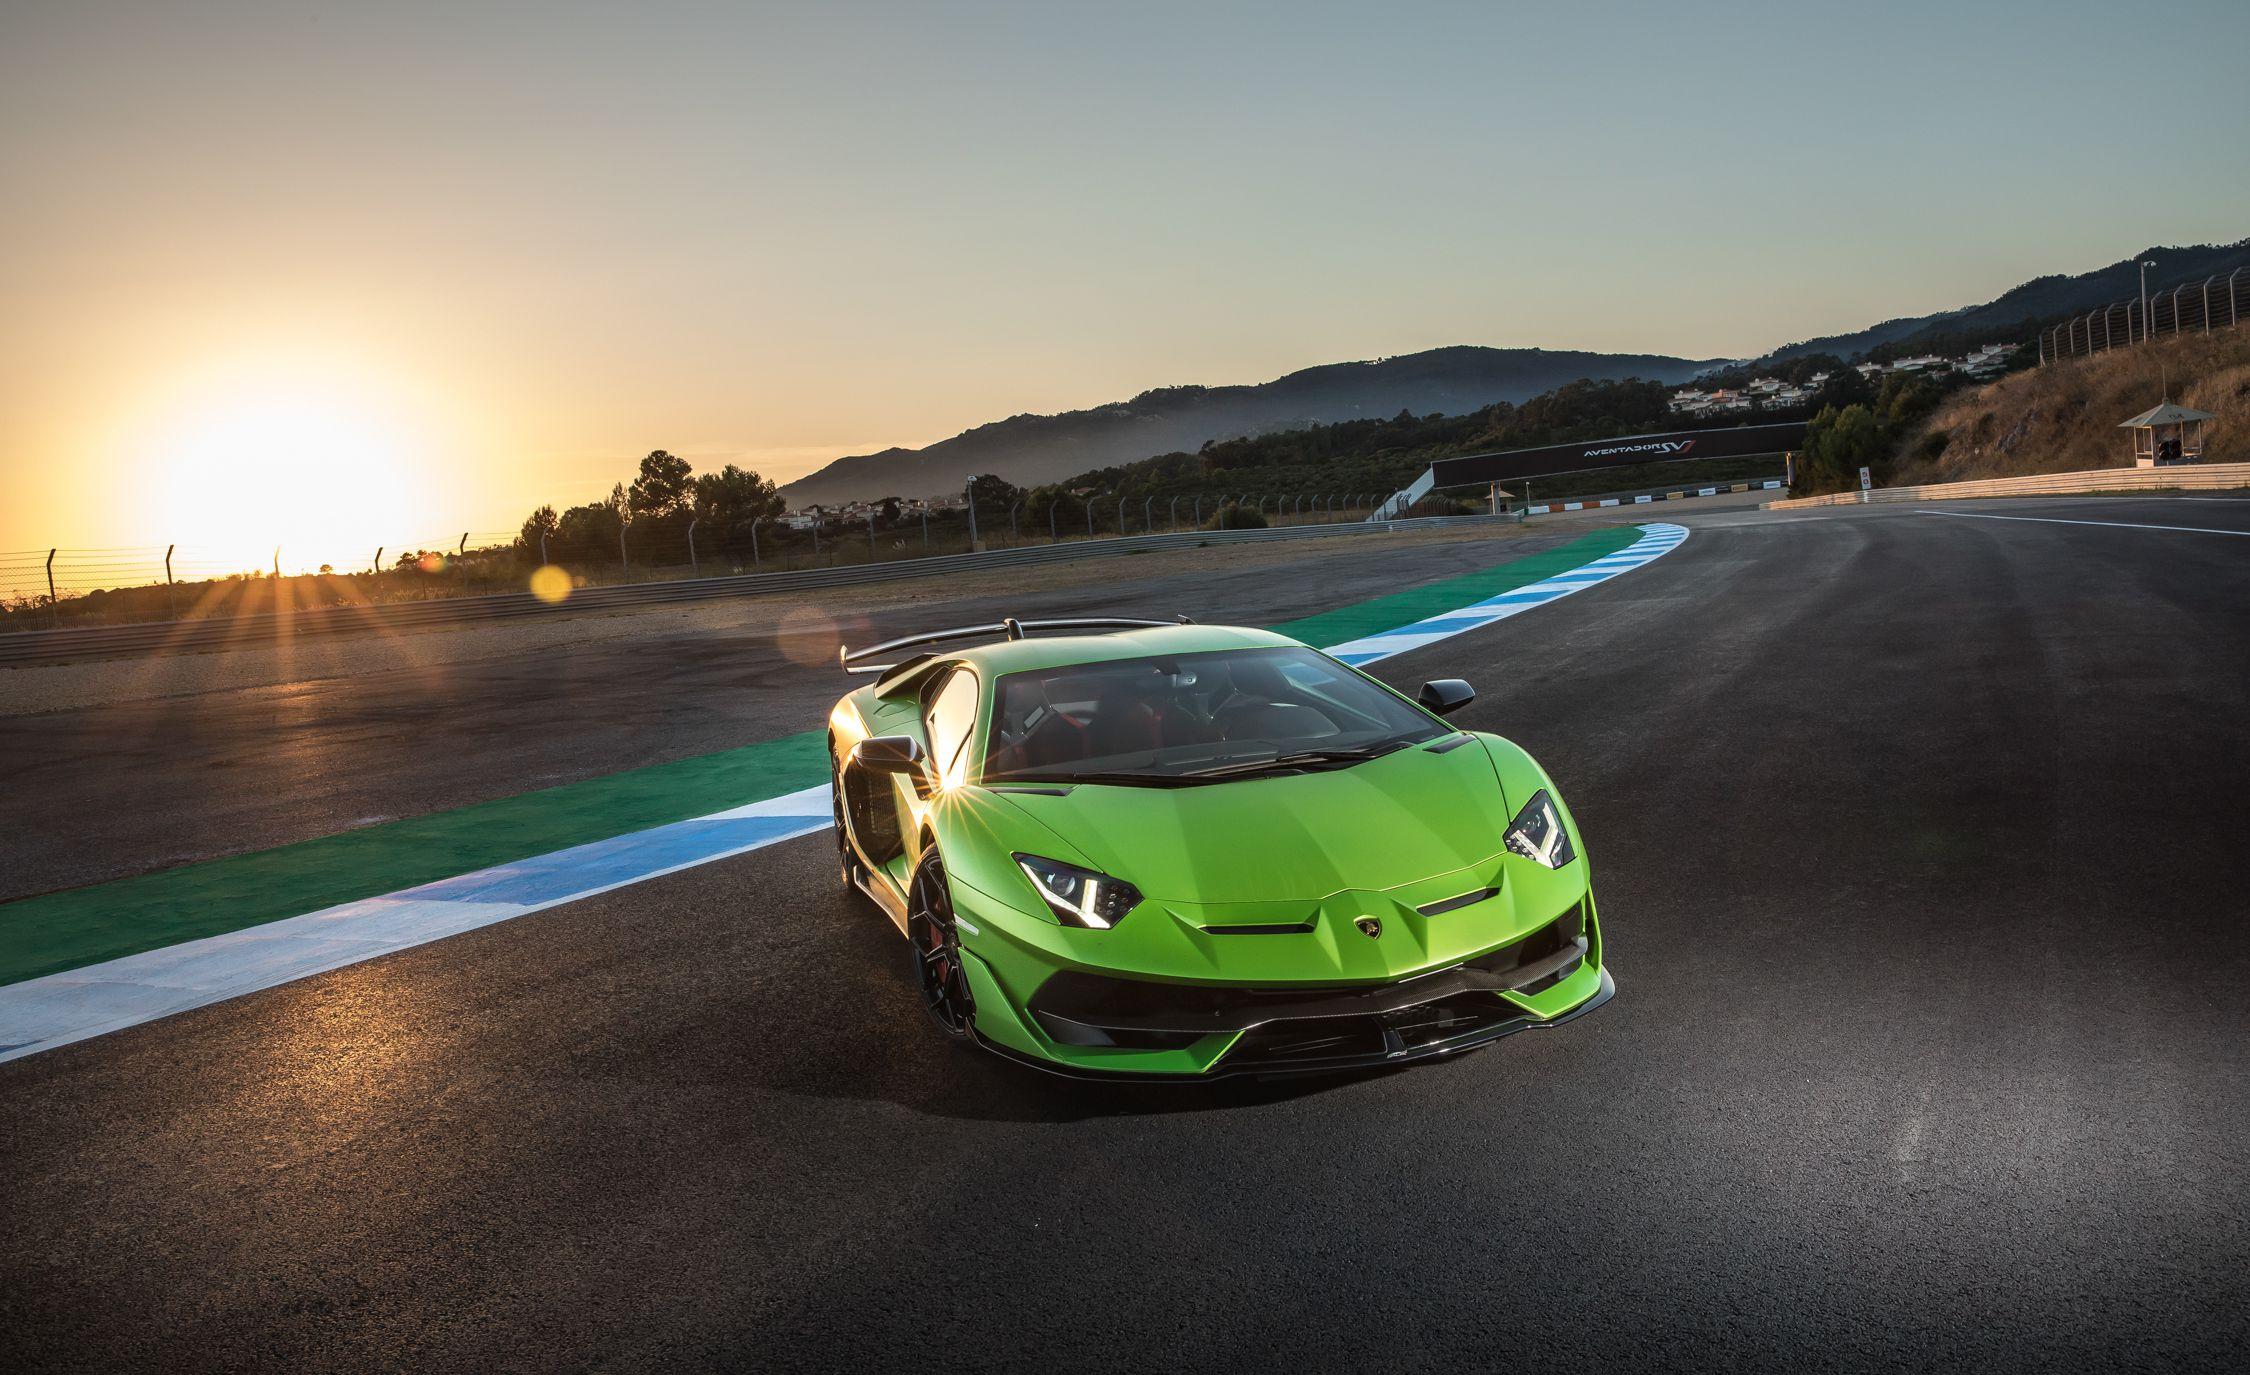 2019 Lamborghini Aventador SVJ Front Wallpapers #148 of 241